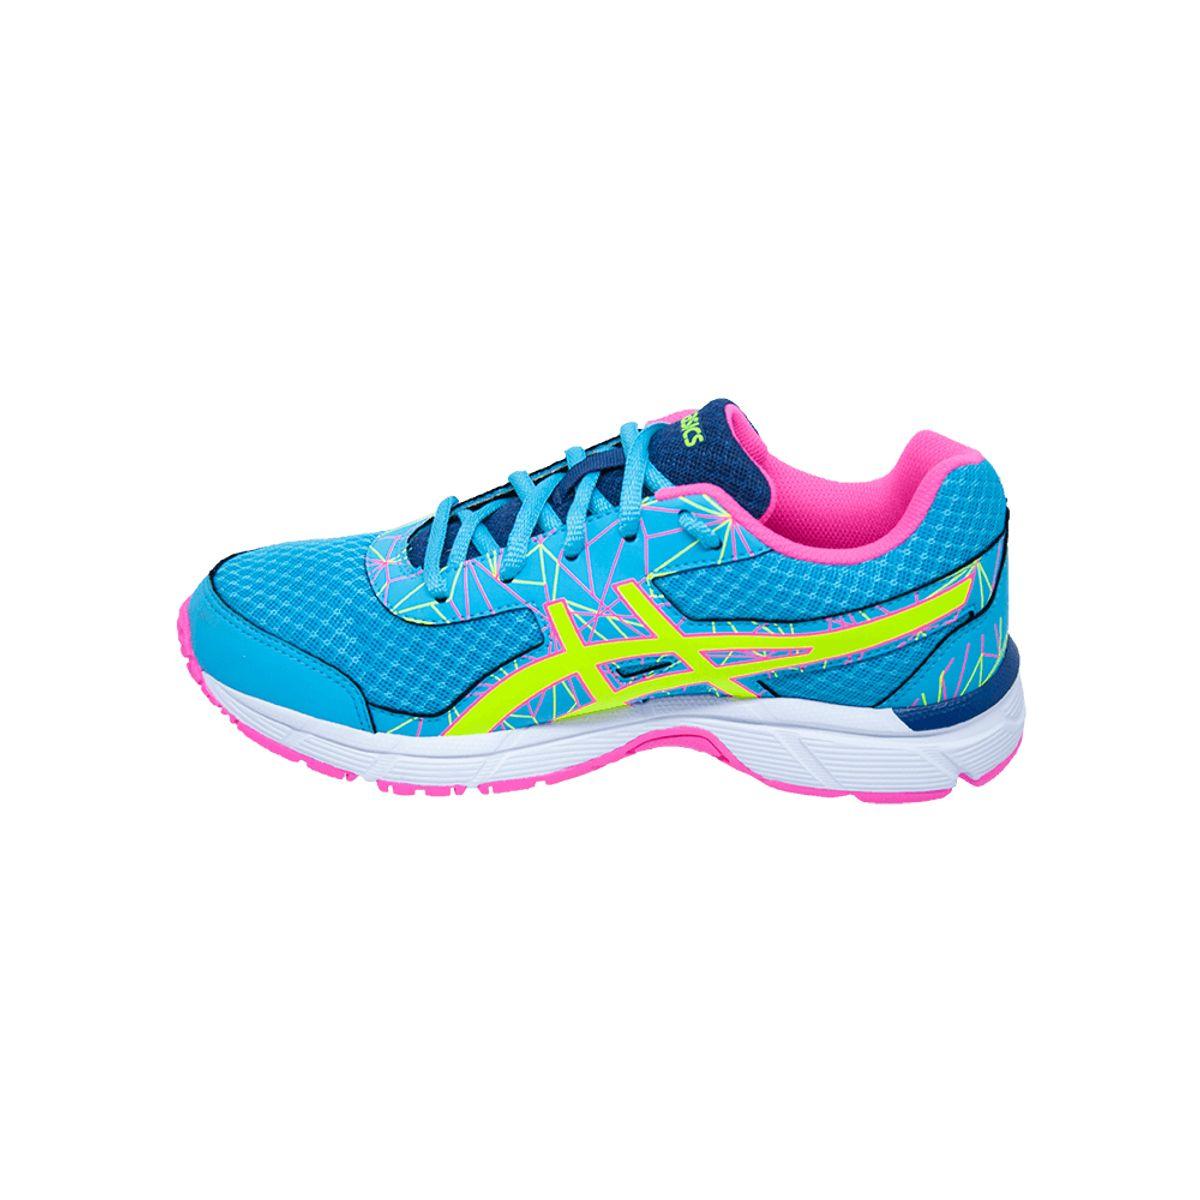 Tenis-Asics-GEL-Light-Play-4-Gs---Infantil---Azul